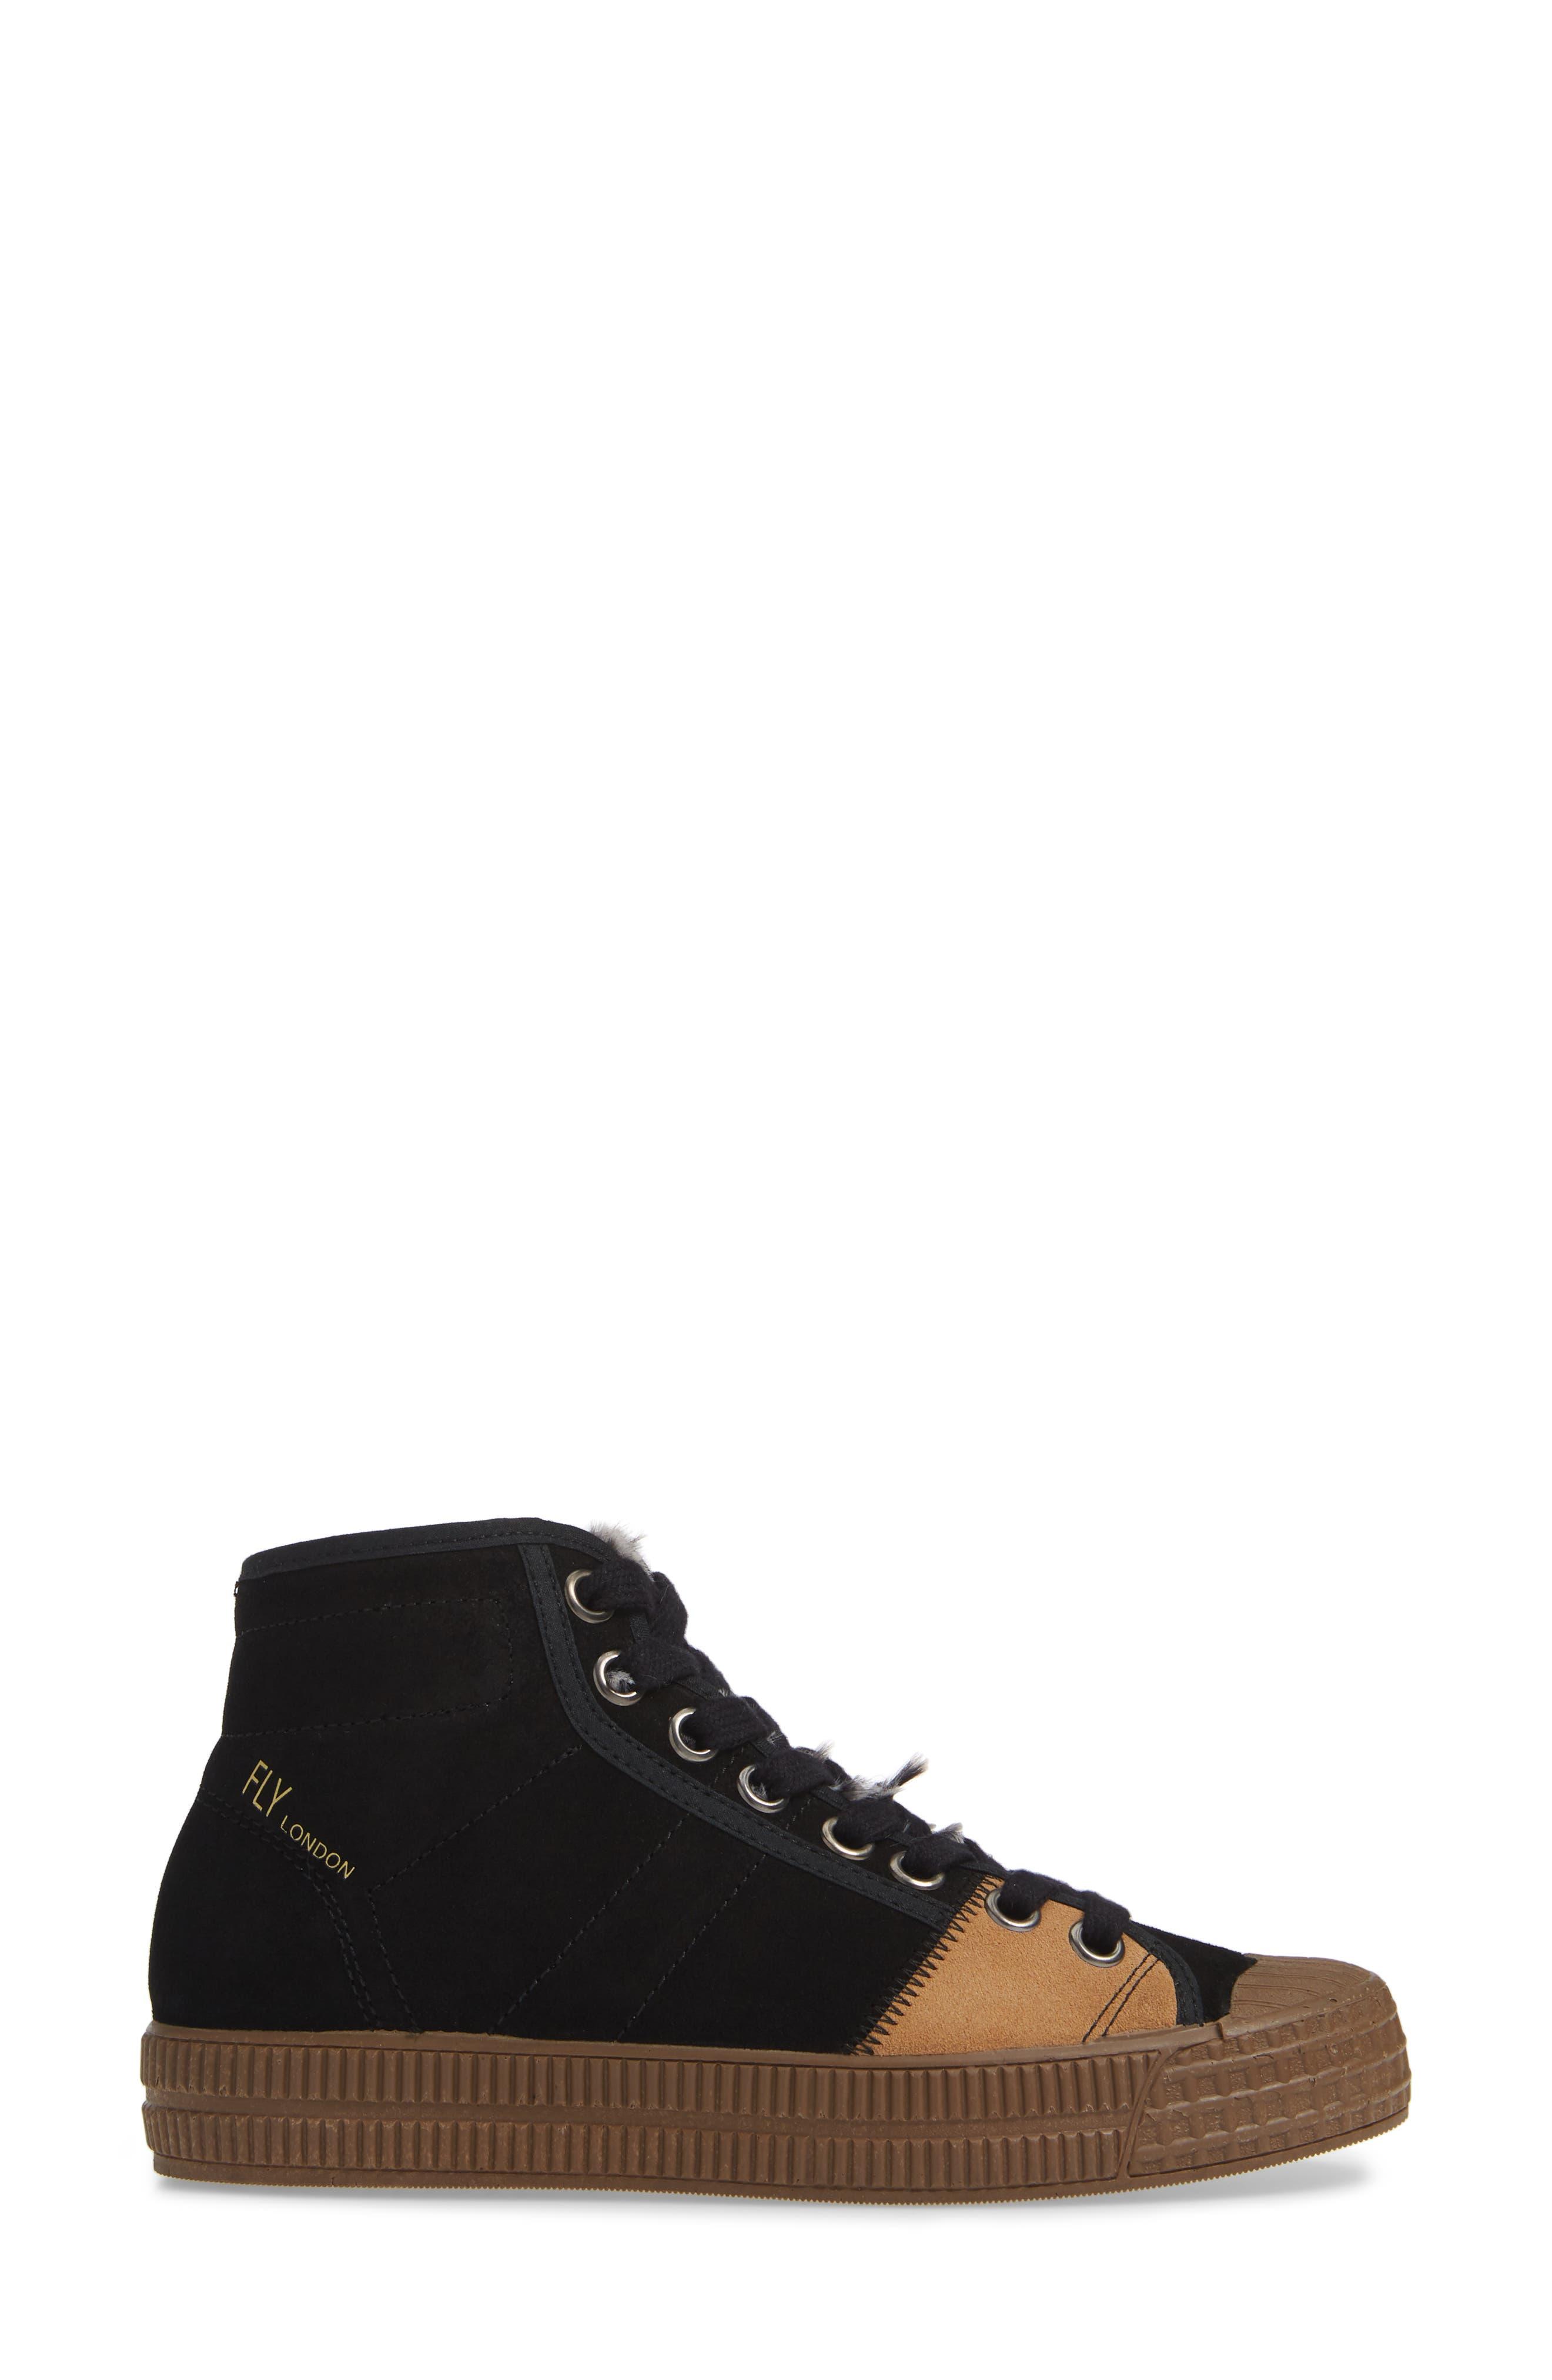 Femp High Top Sneaker,                             Alternate thumbnail 3, color,                             BLACK/ CAMEL SUEDE